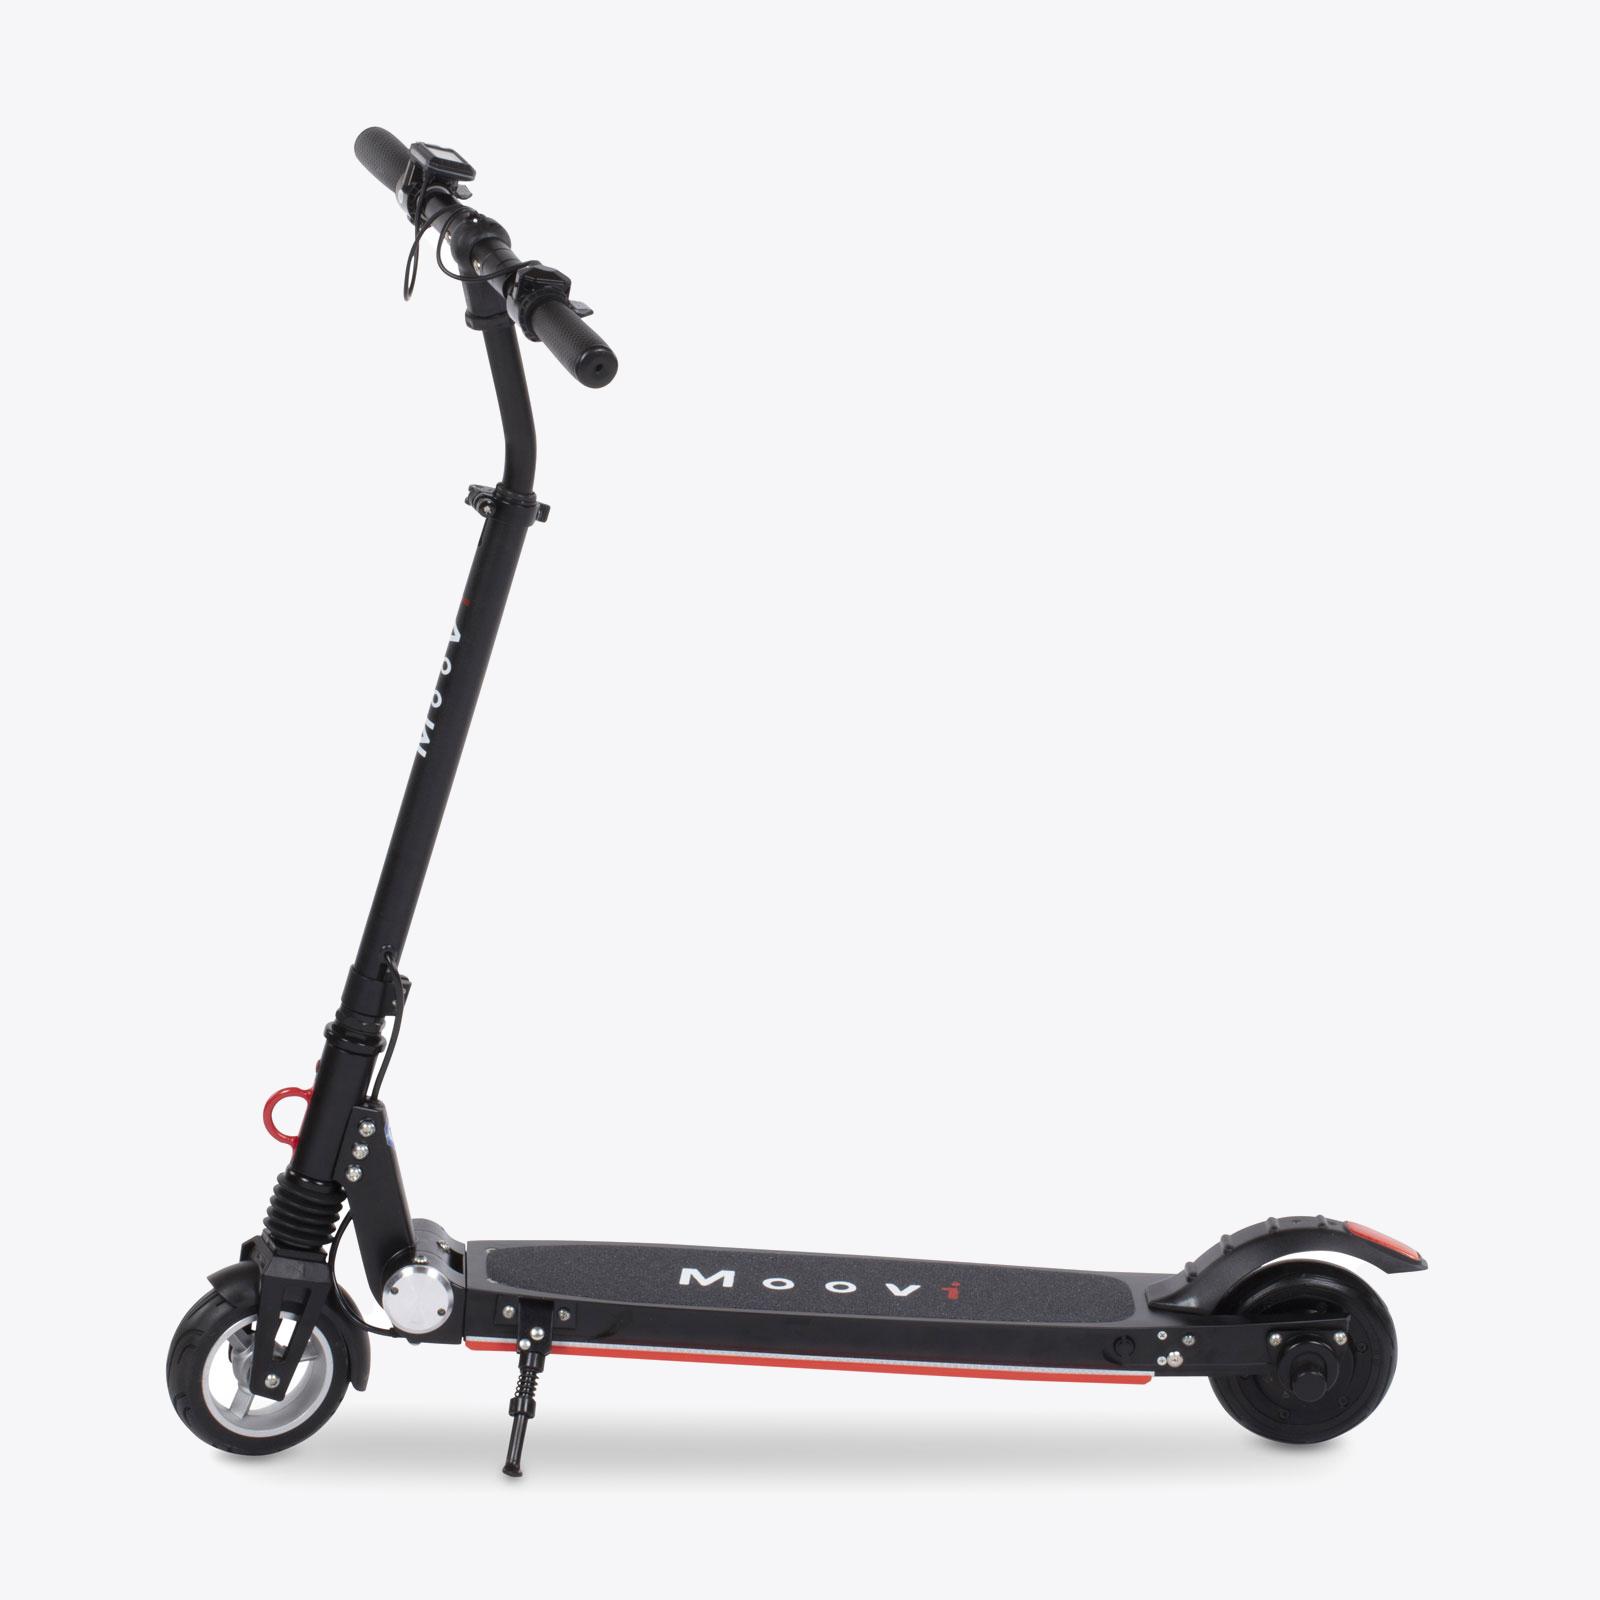 moovi-escooter-seite-staender